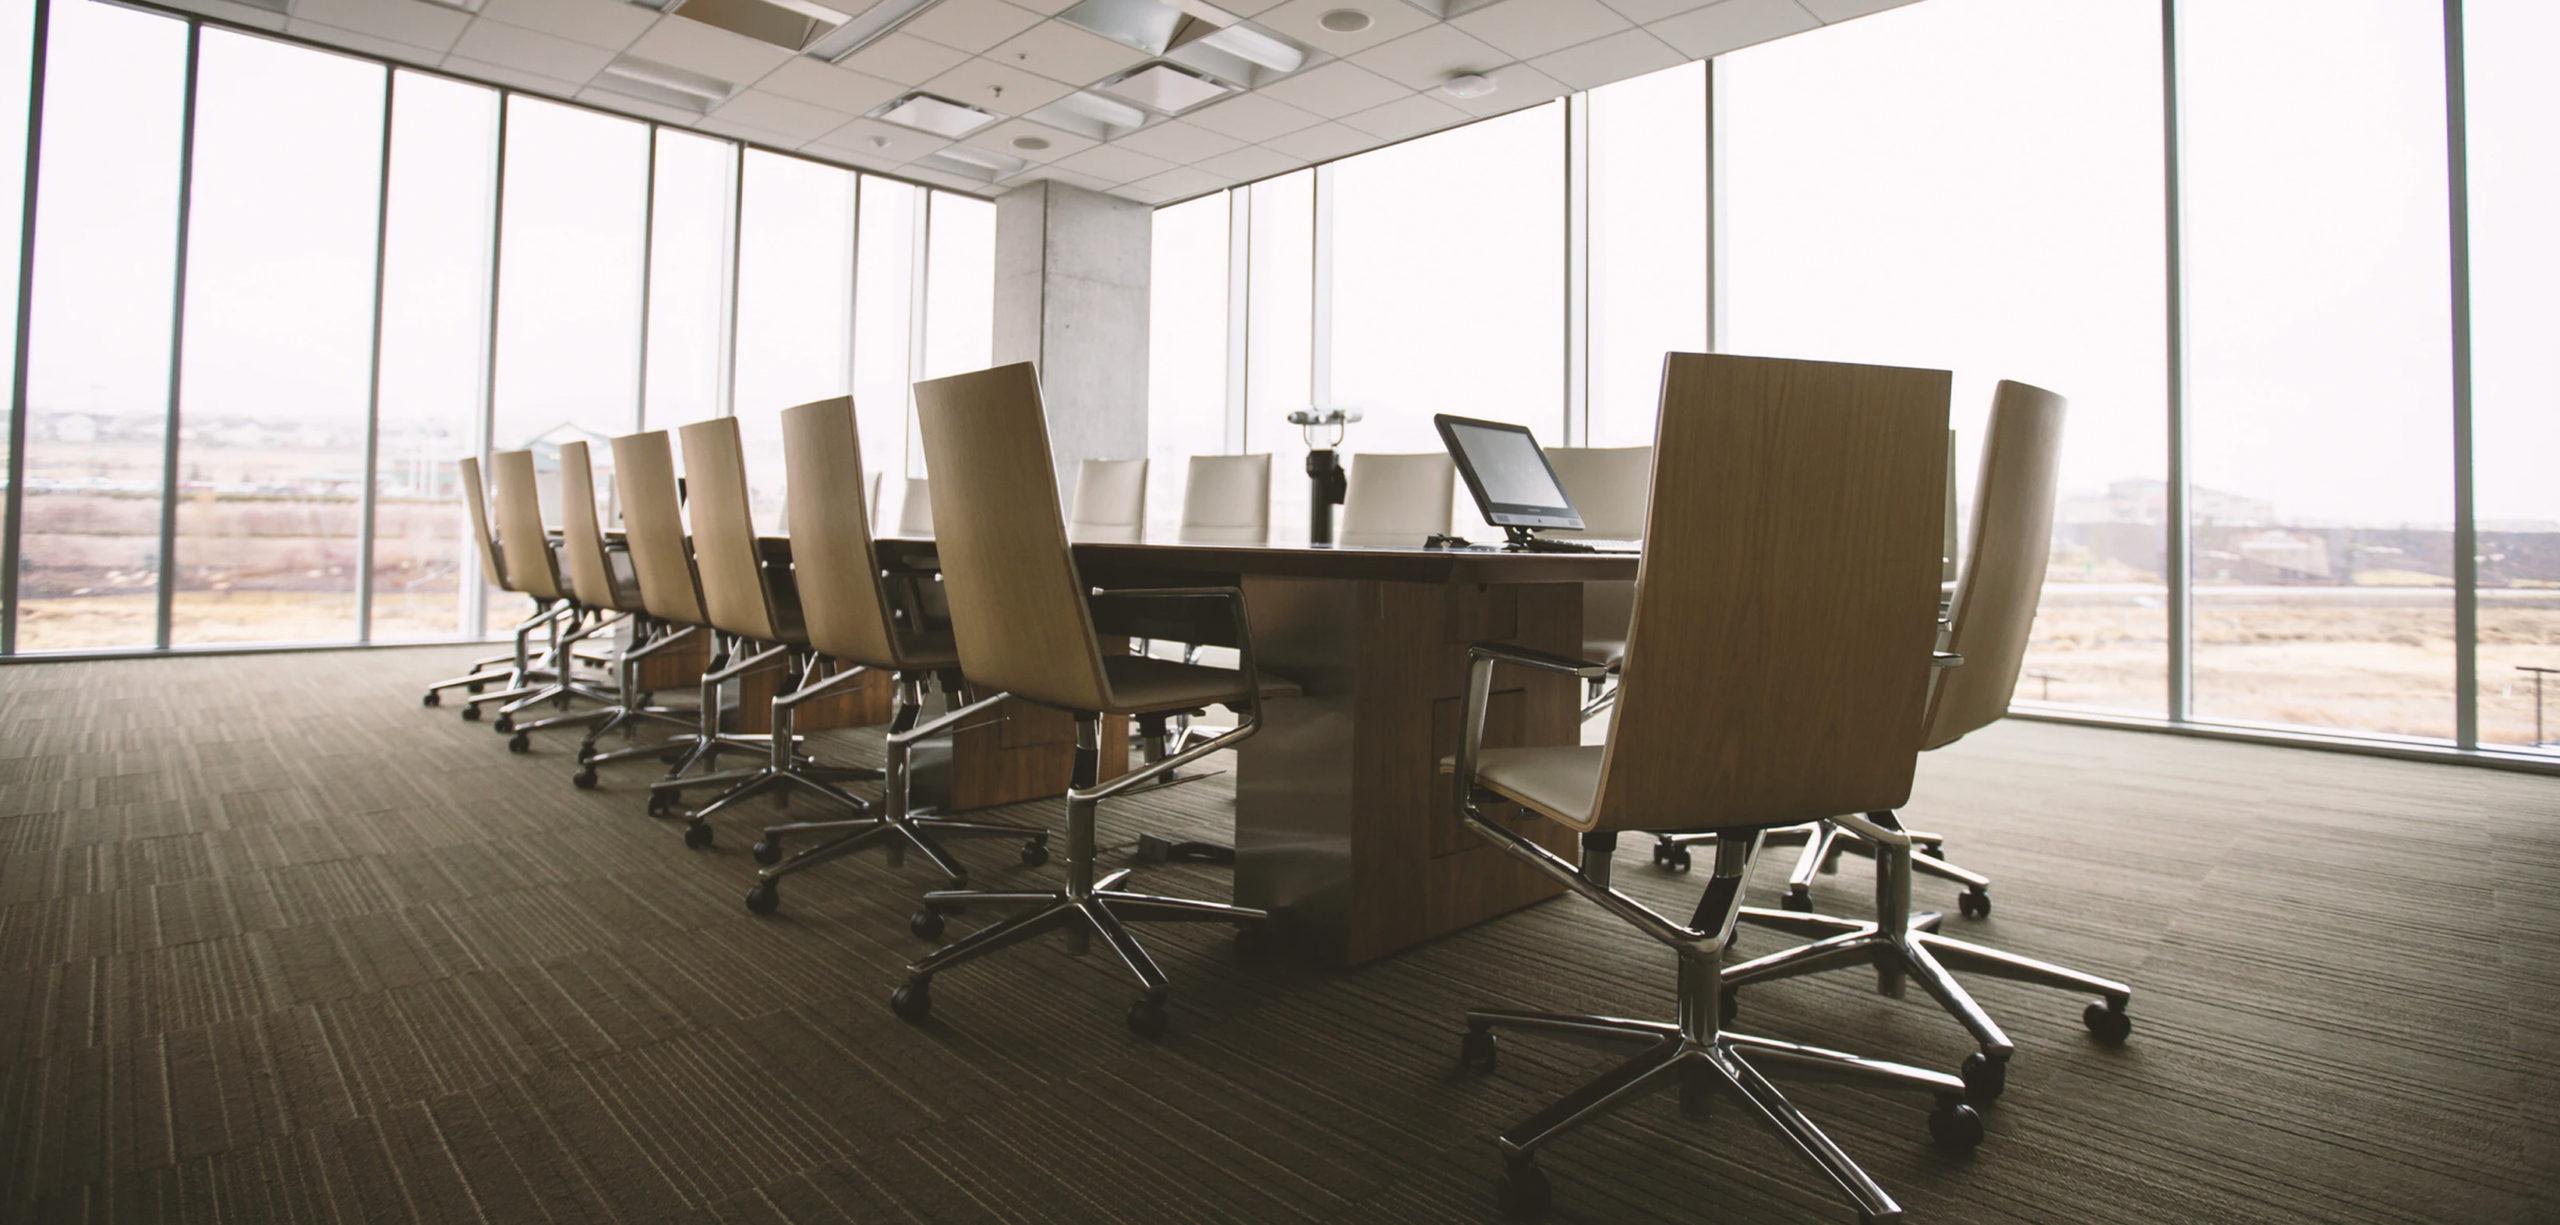 Board meeting room display